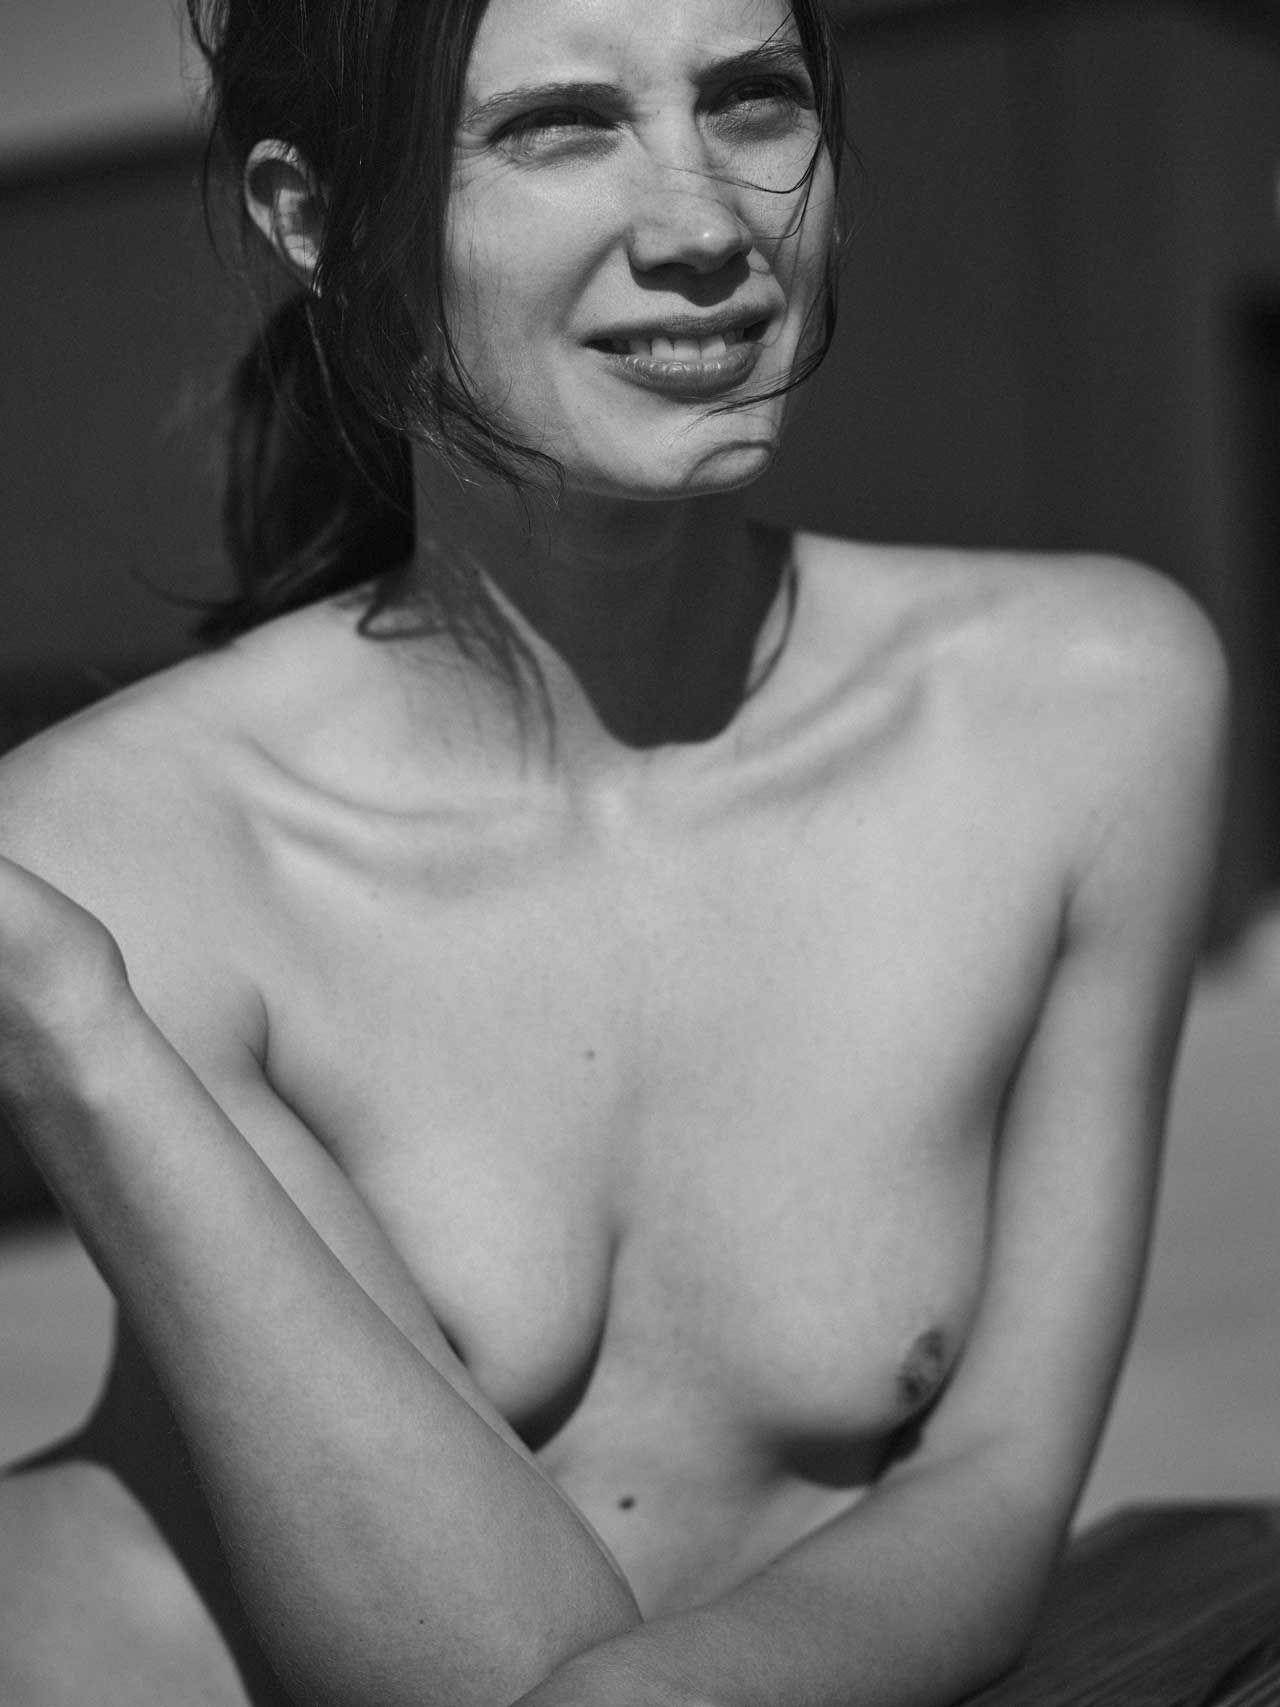 Epic burnette nude exploited photo